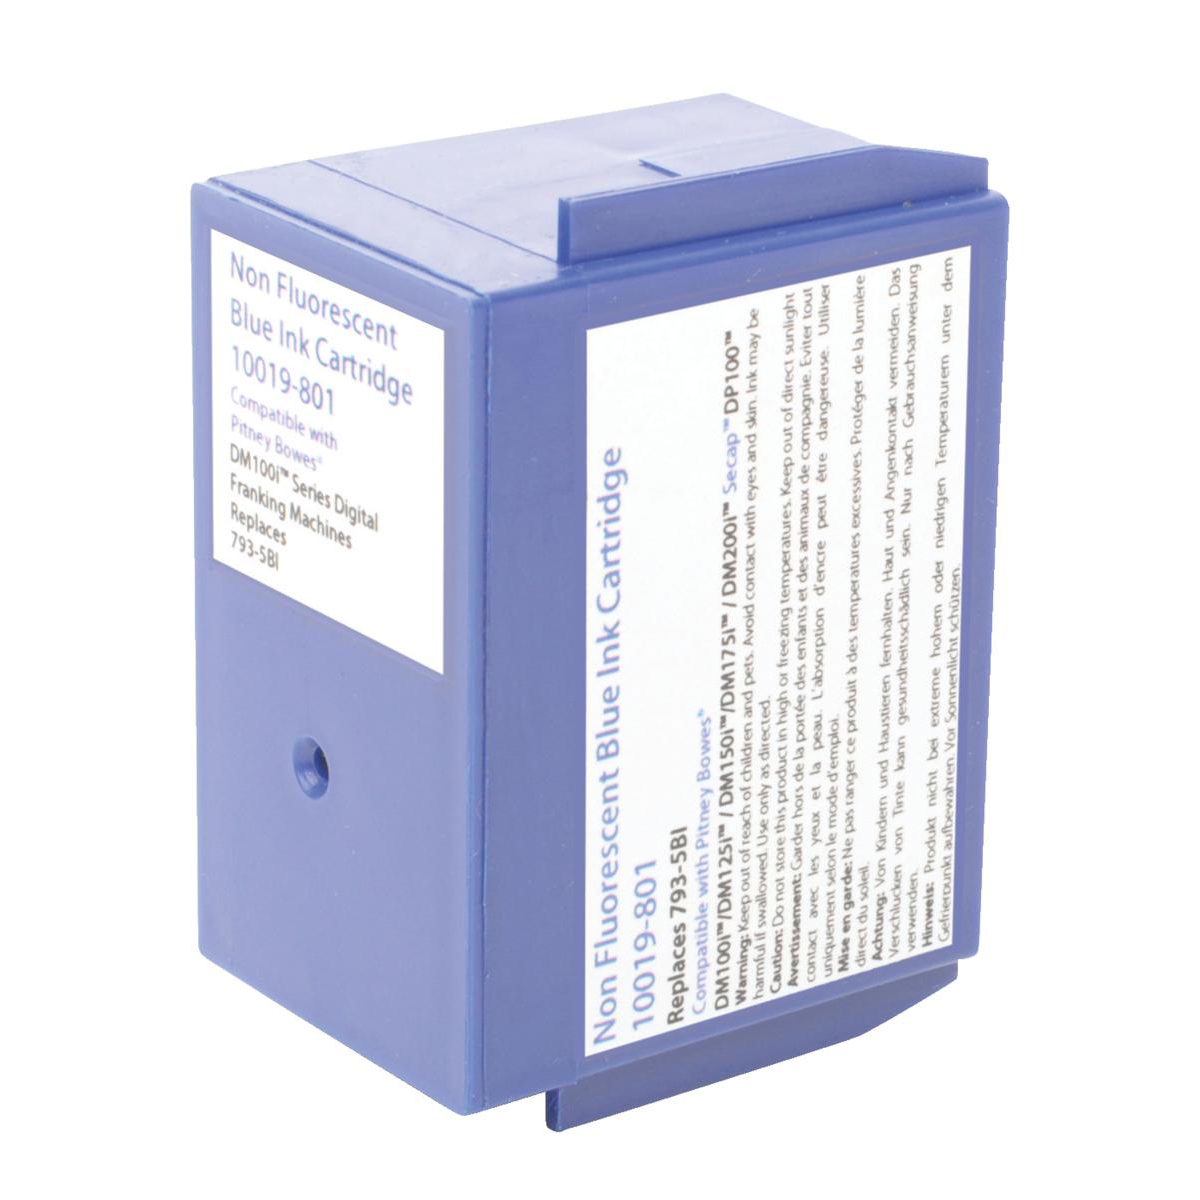 Image for Totalpost Franking Inkjet Cartridge Blue [Pitney Bowes DM100i Series Equivalent] Ref 10019-801